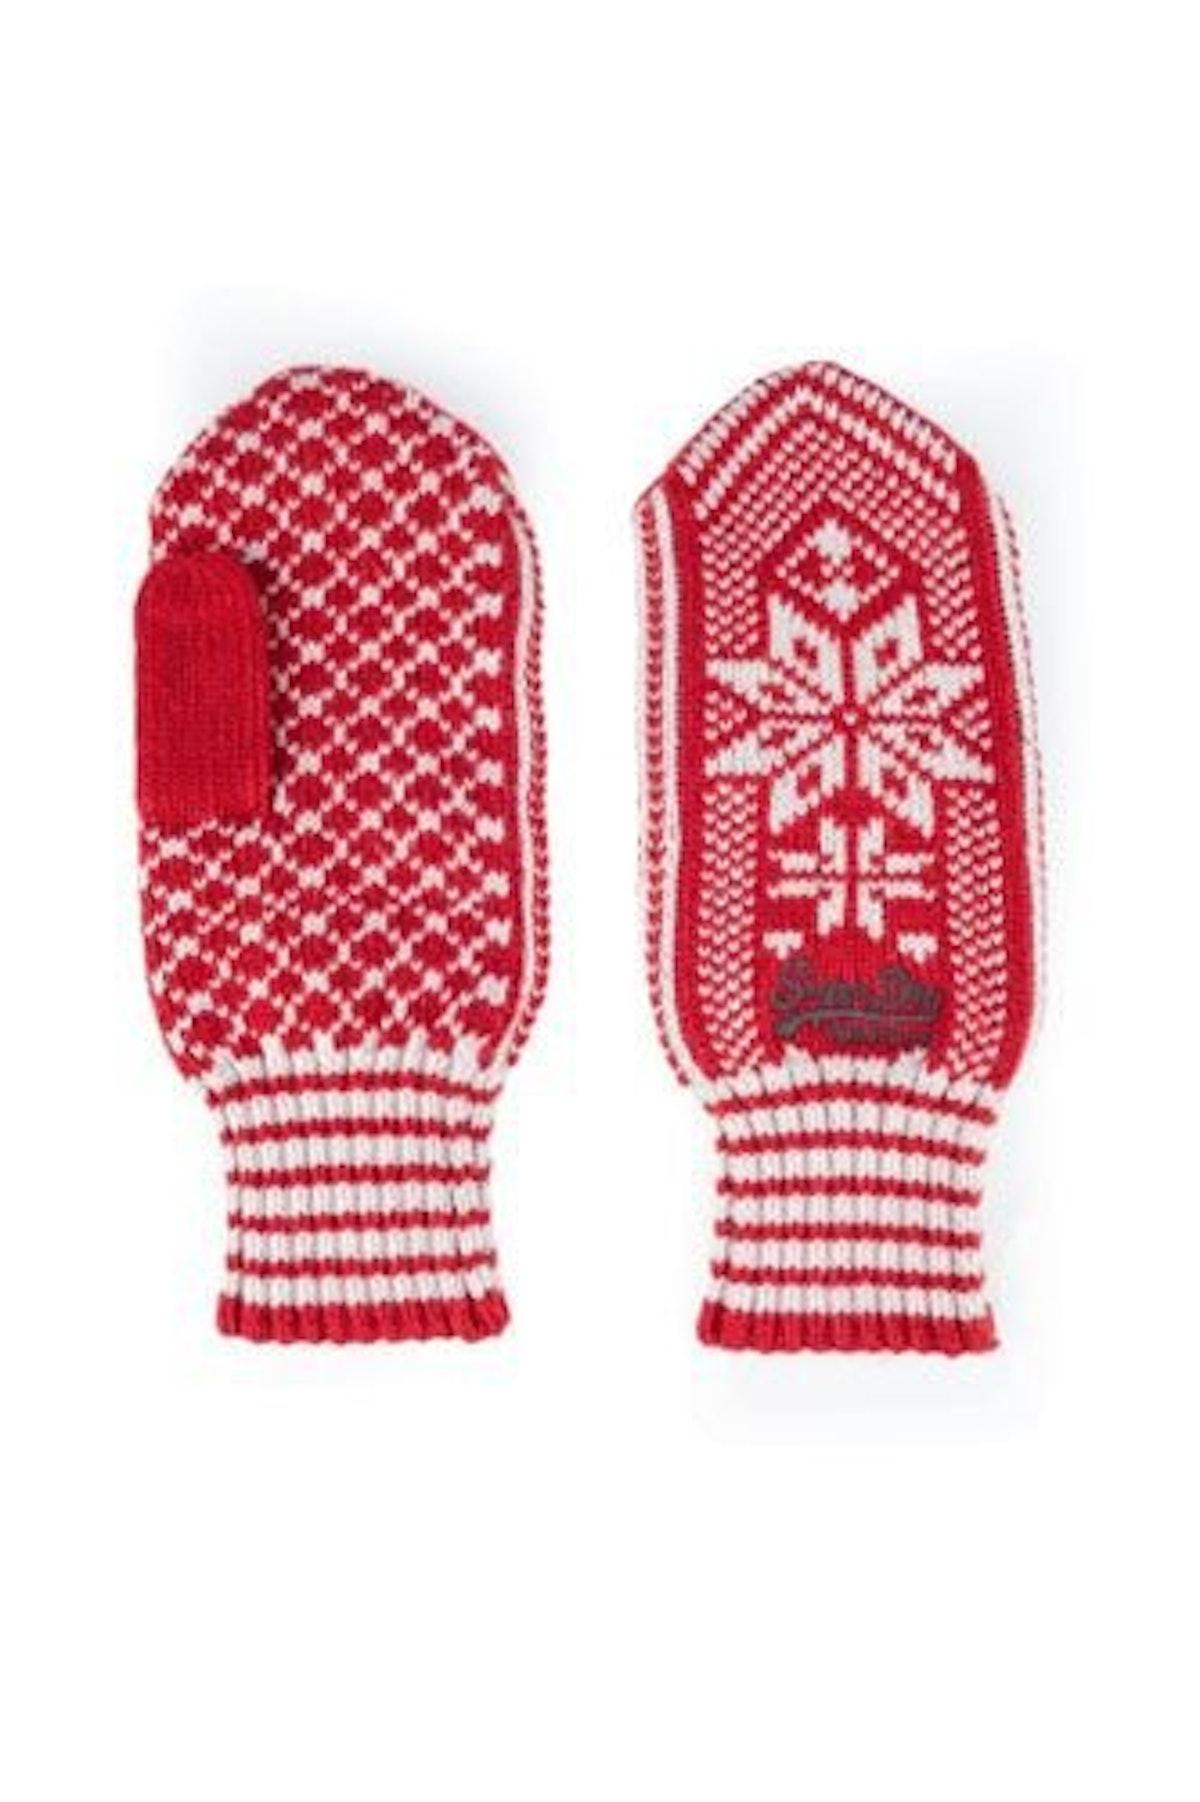 Shop Stylish Ski Clothing and Cold Weather Fashion | Stylist